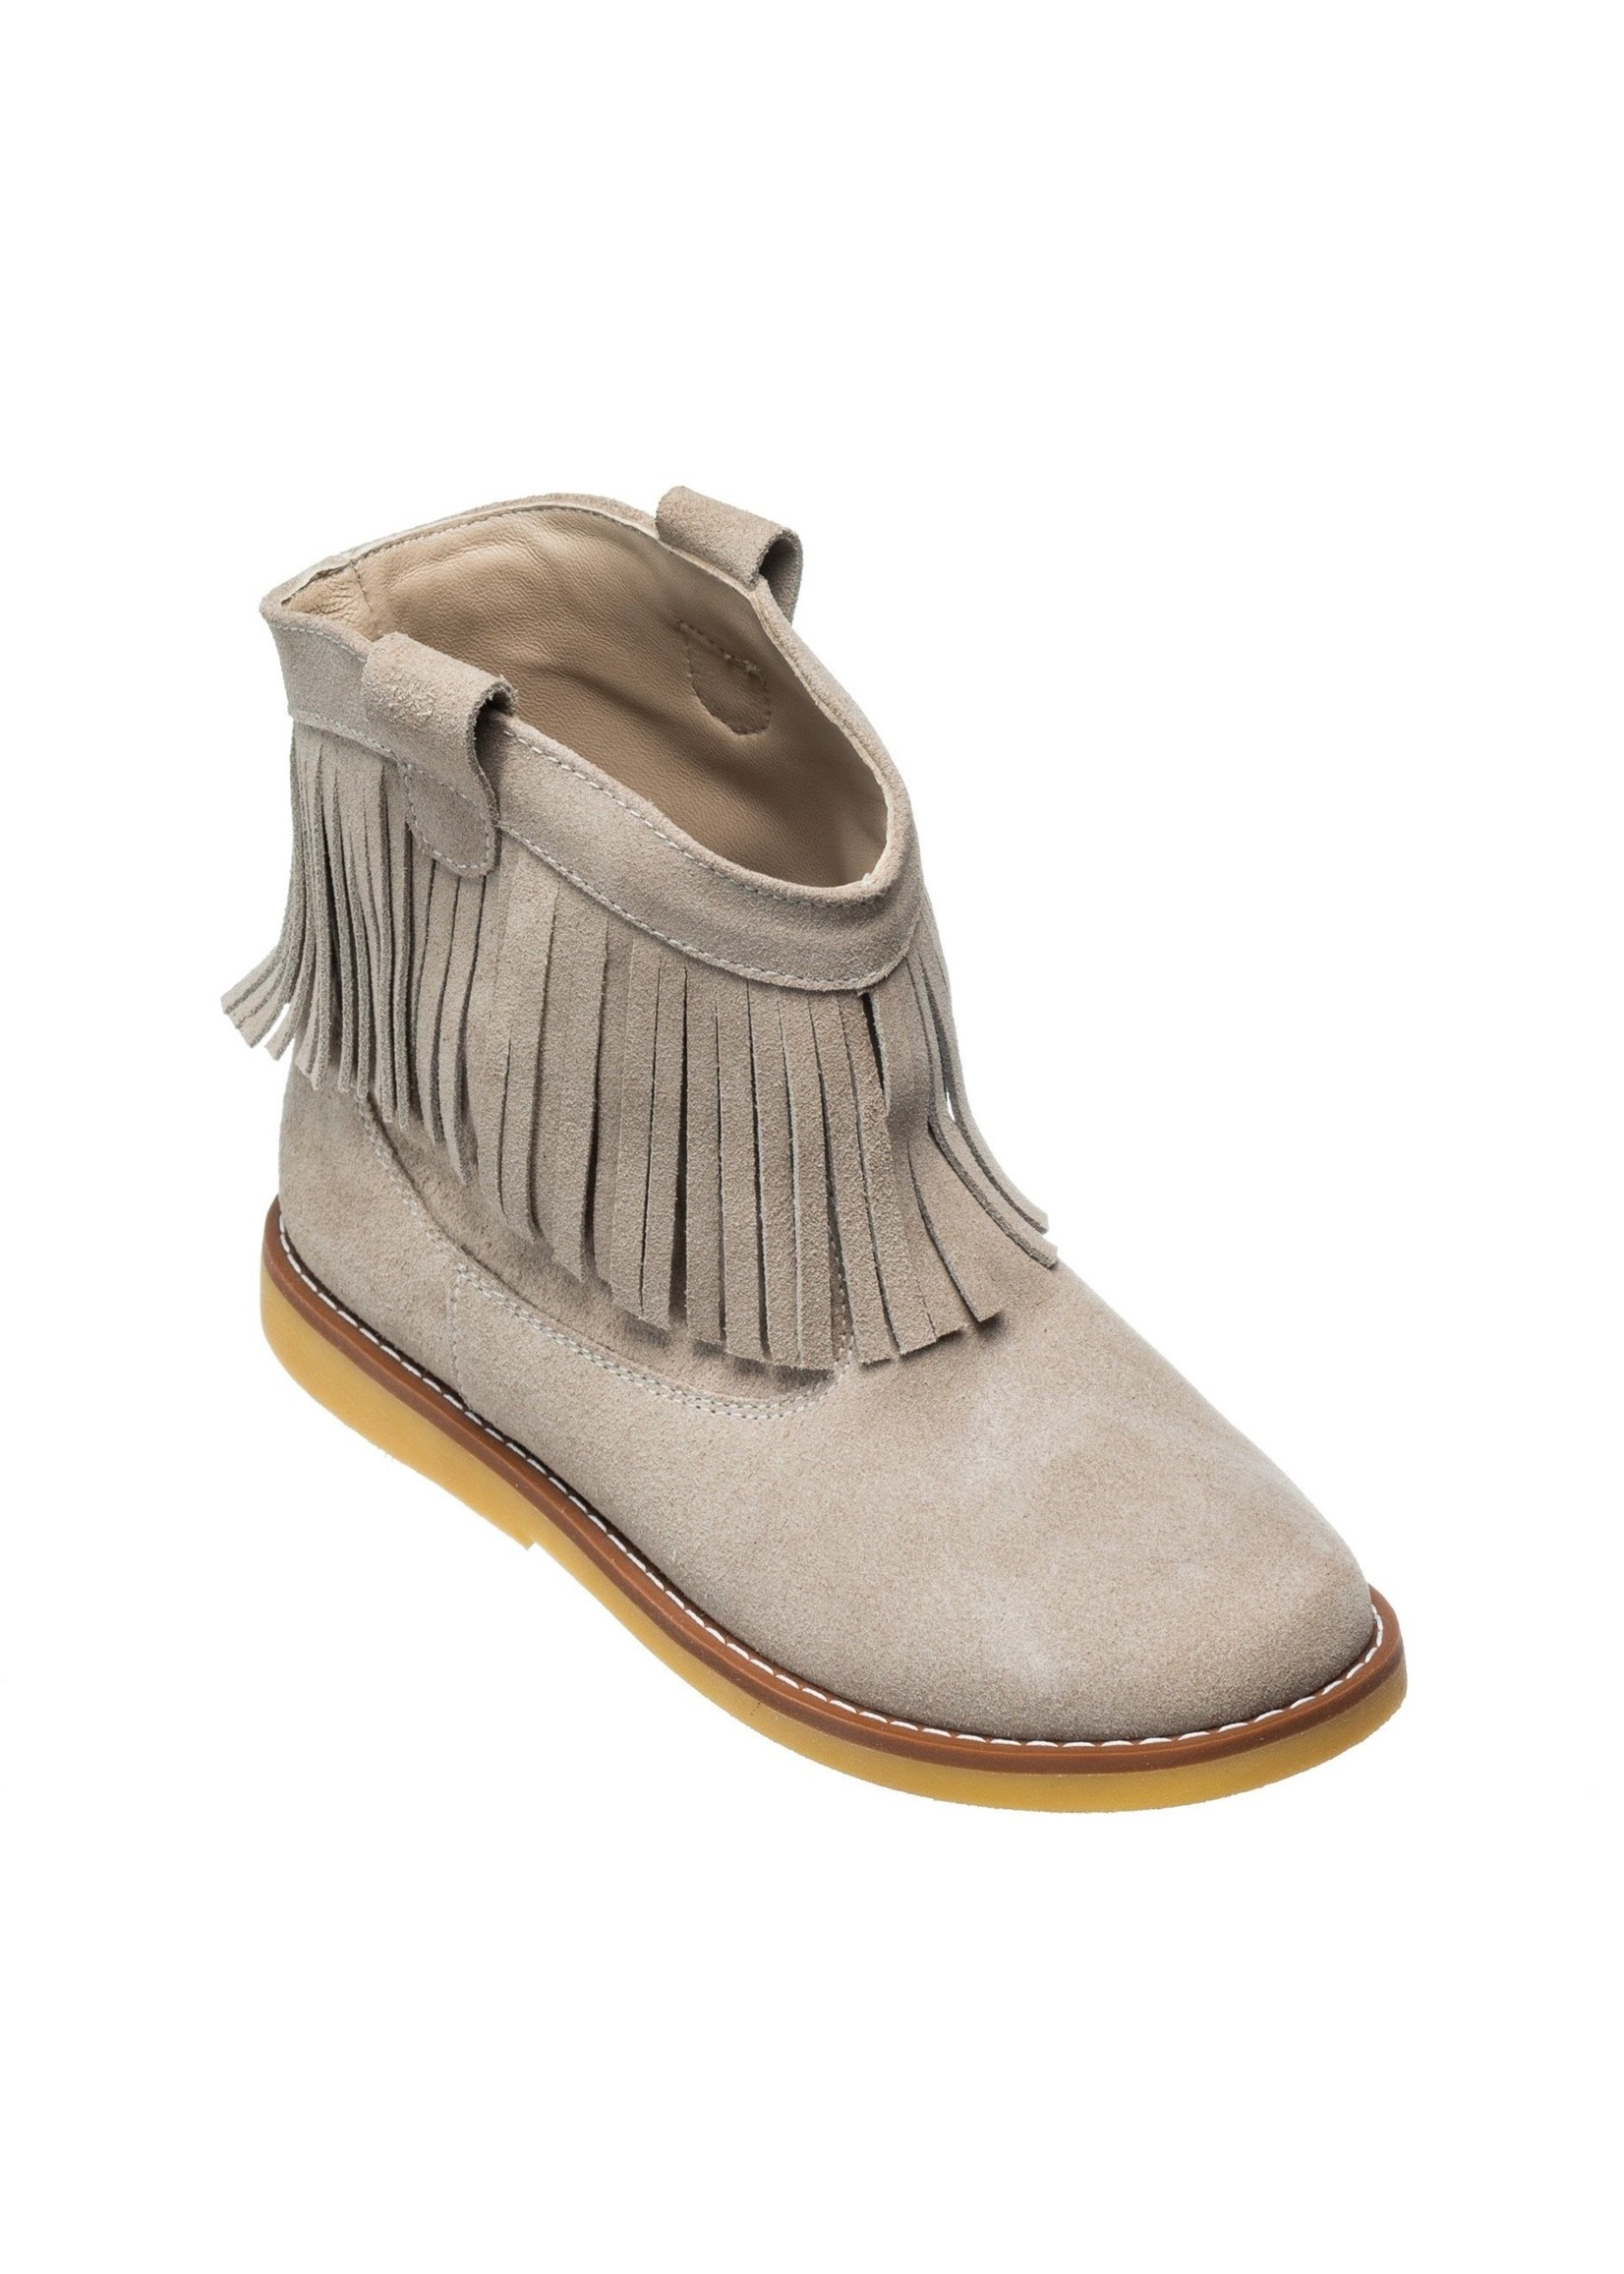 Elephantito Bootie w/ Fringes Suede Sand